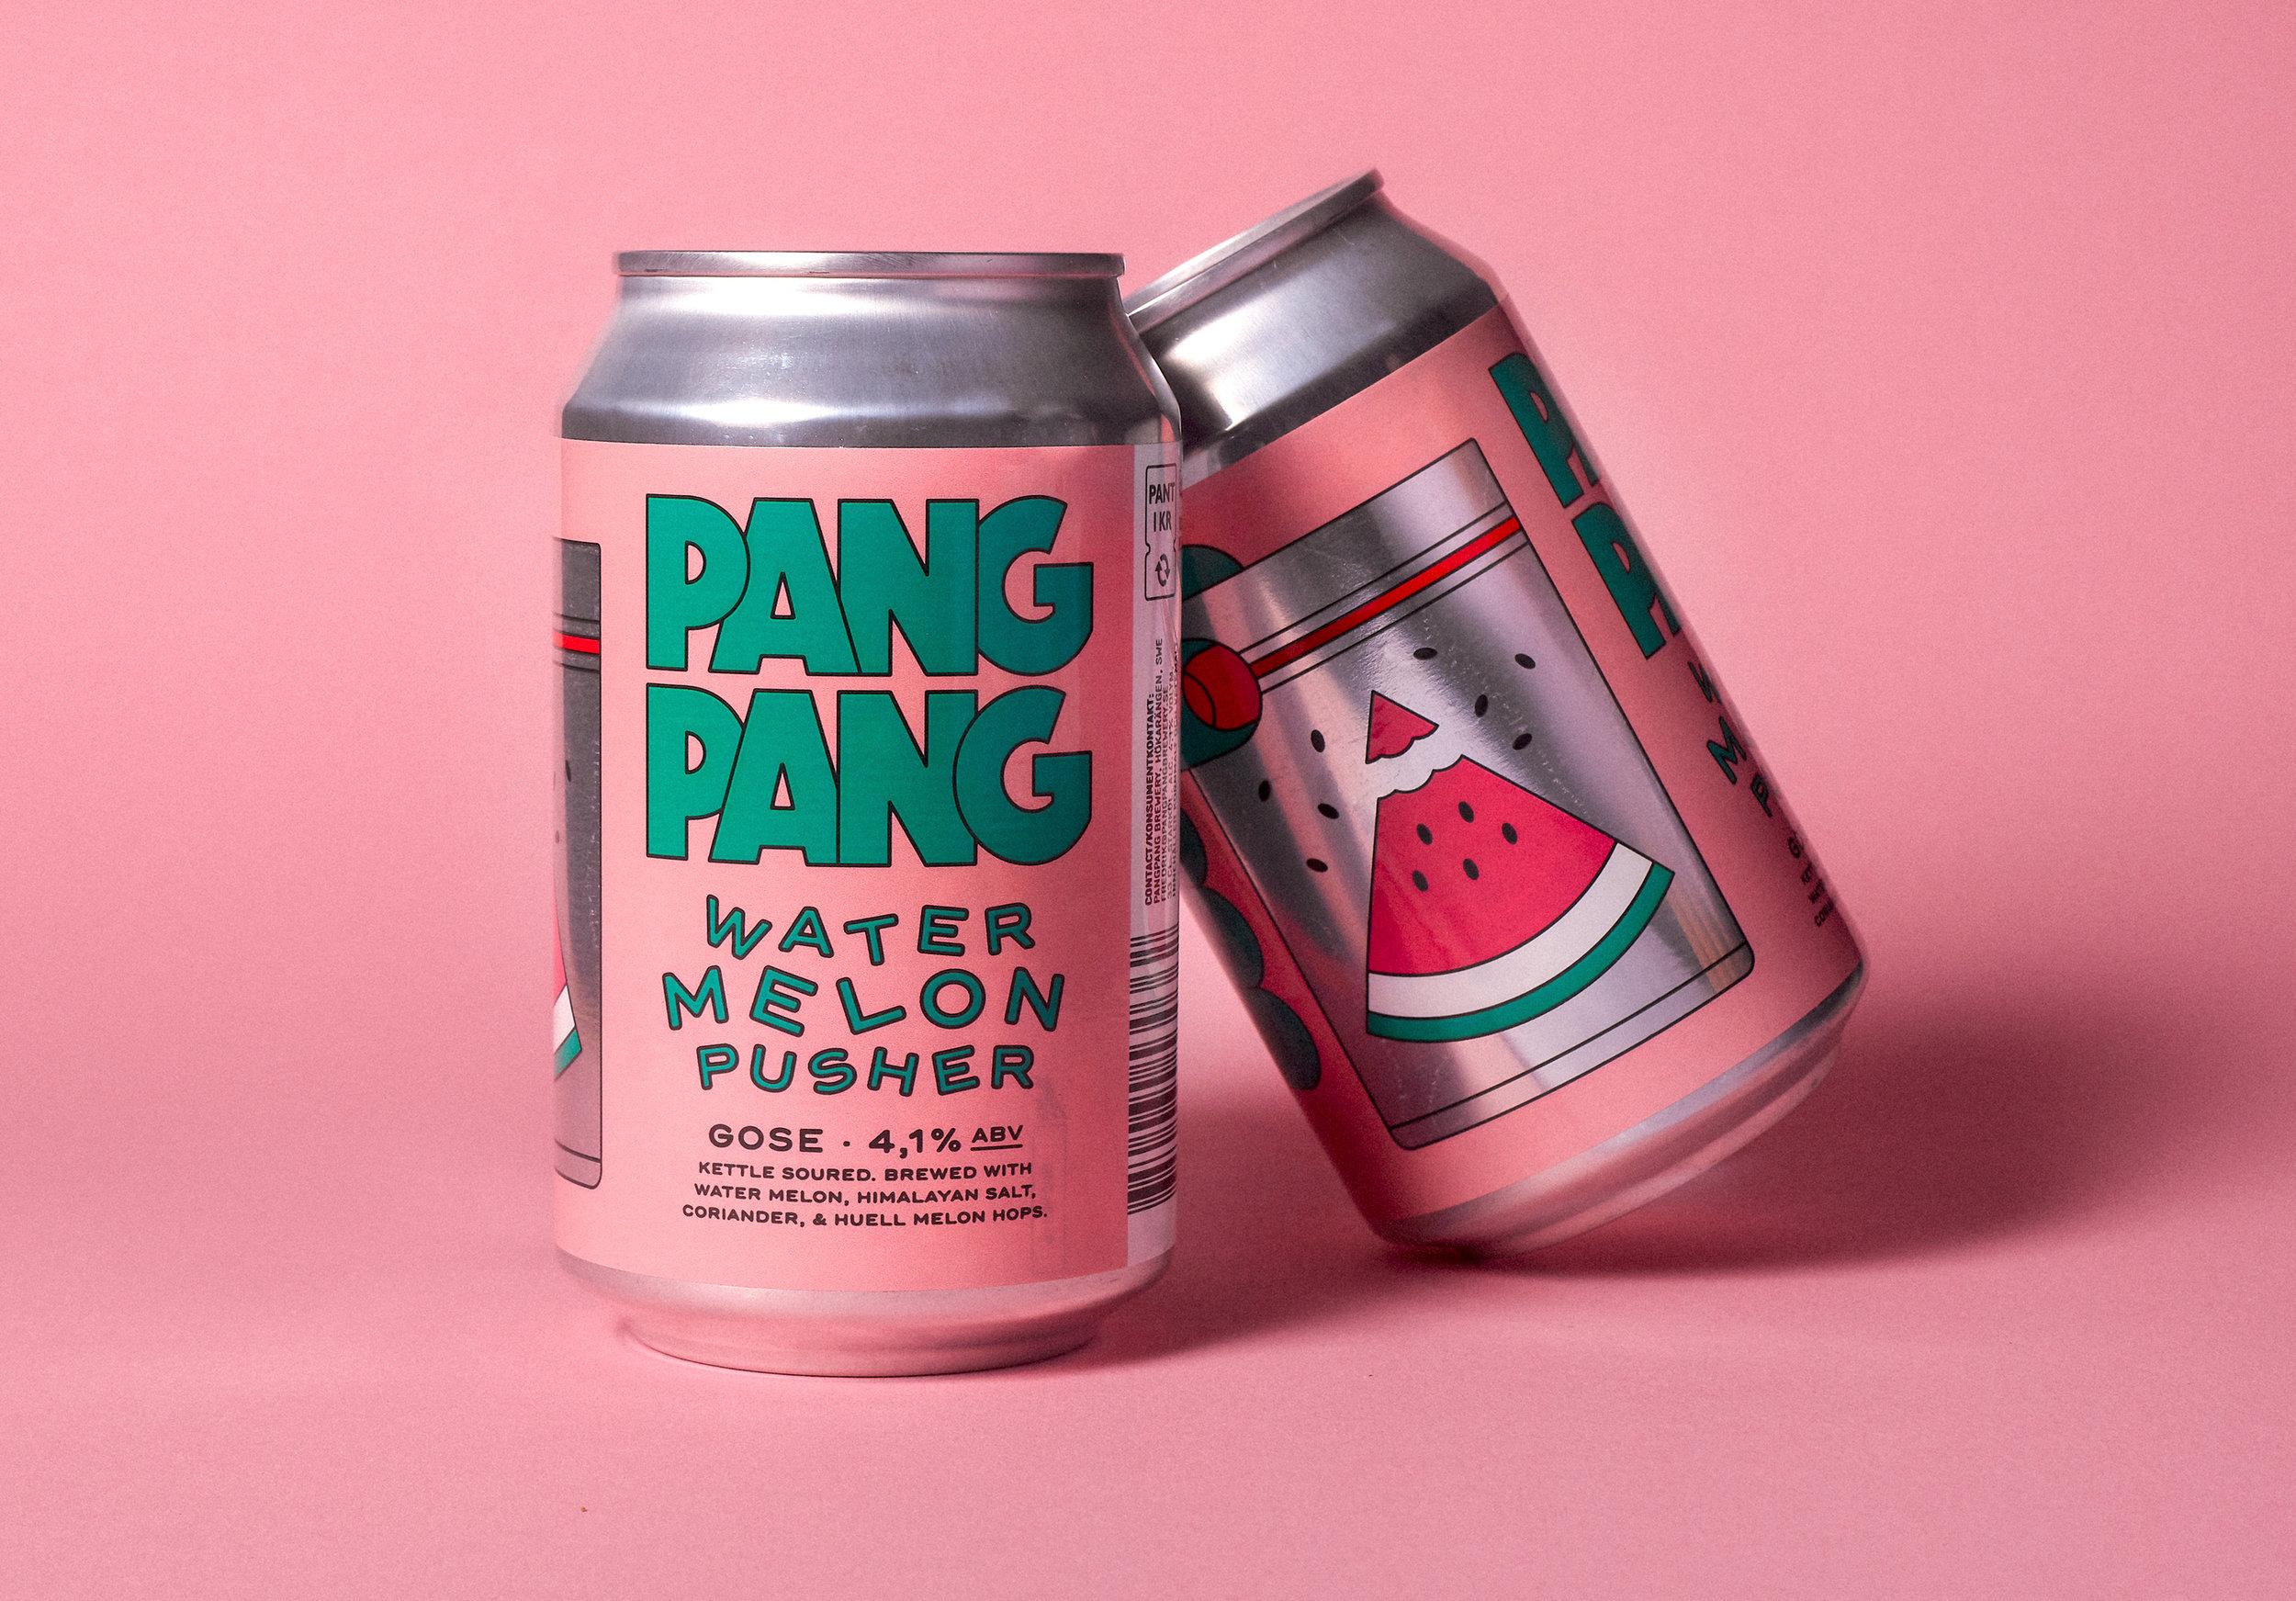 pangpang_watermelon-pusher_bild06_avlang-klippt.jpg